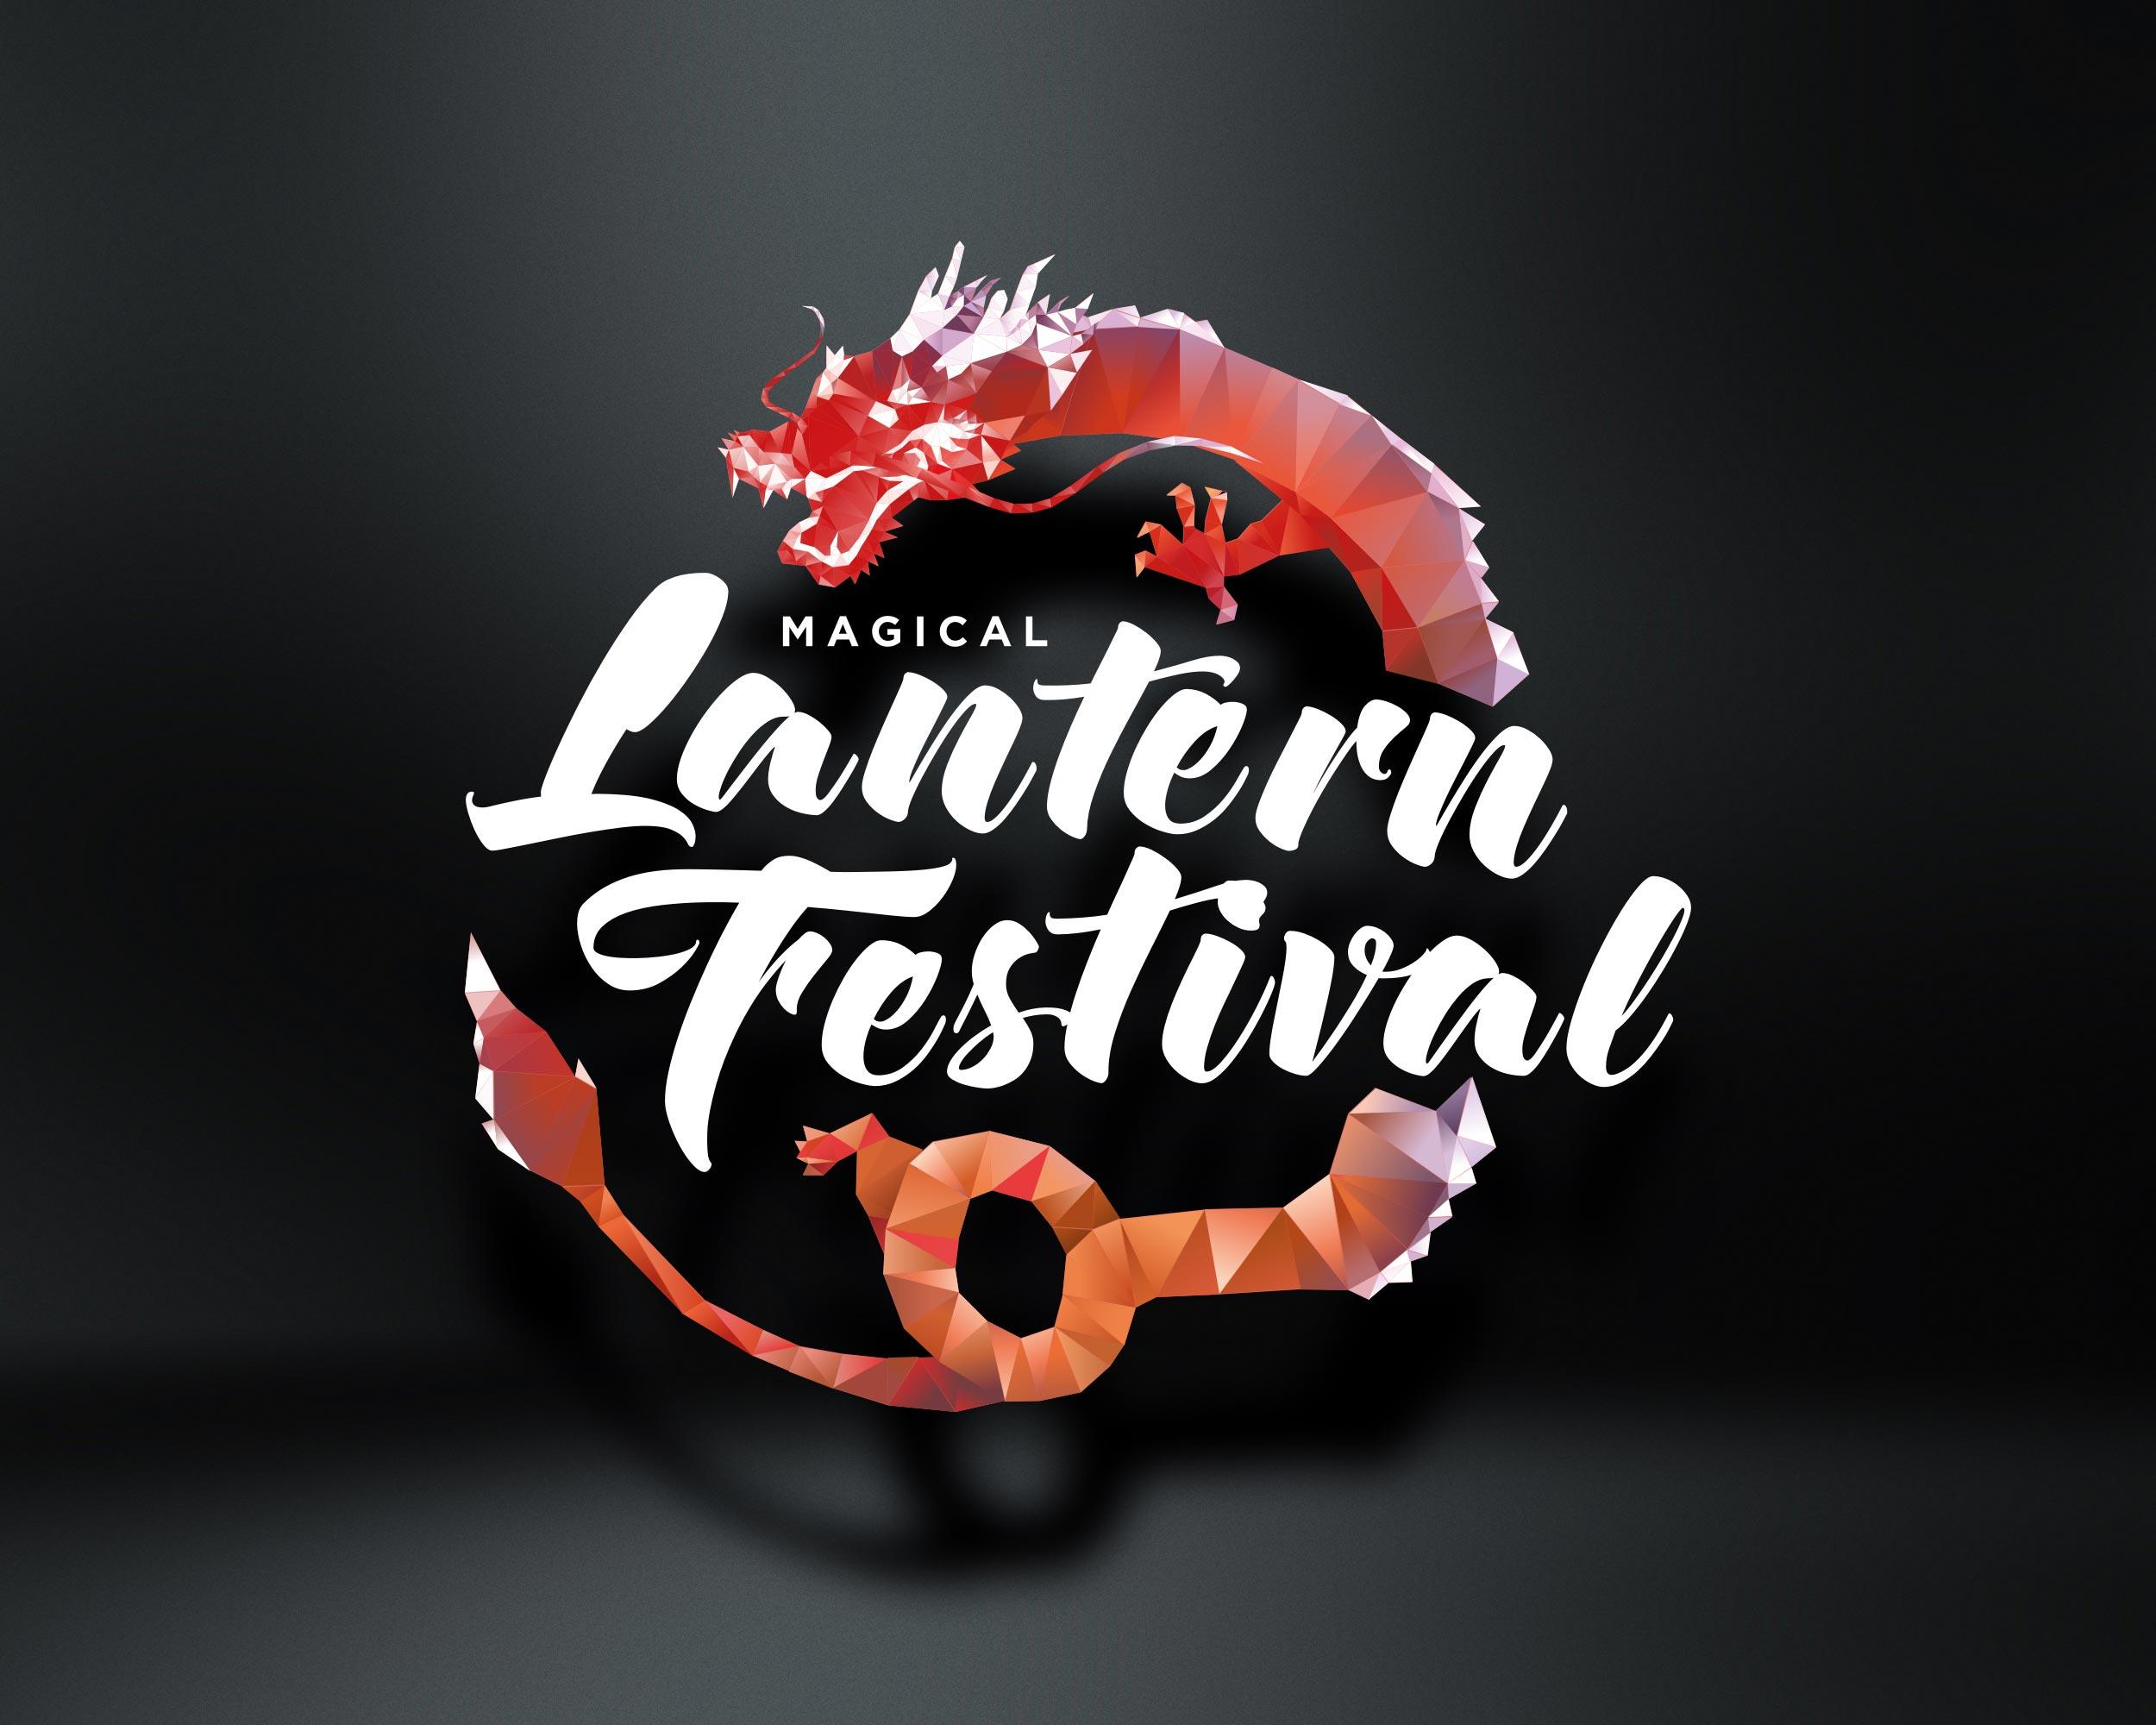 Magical Lantern Festival Logo